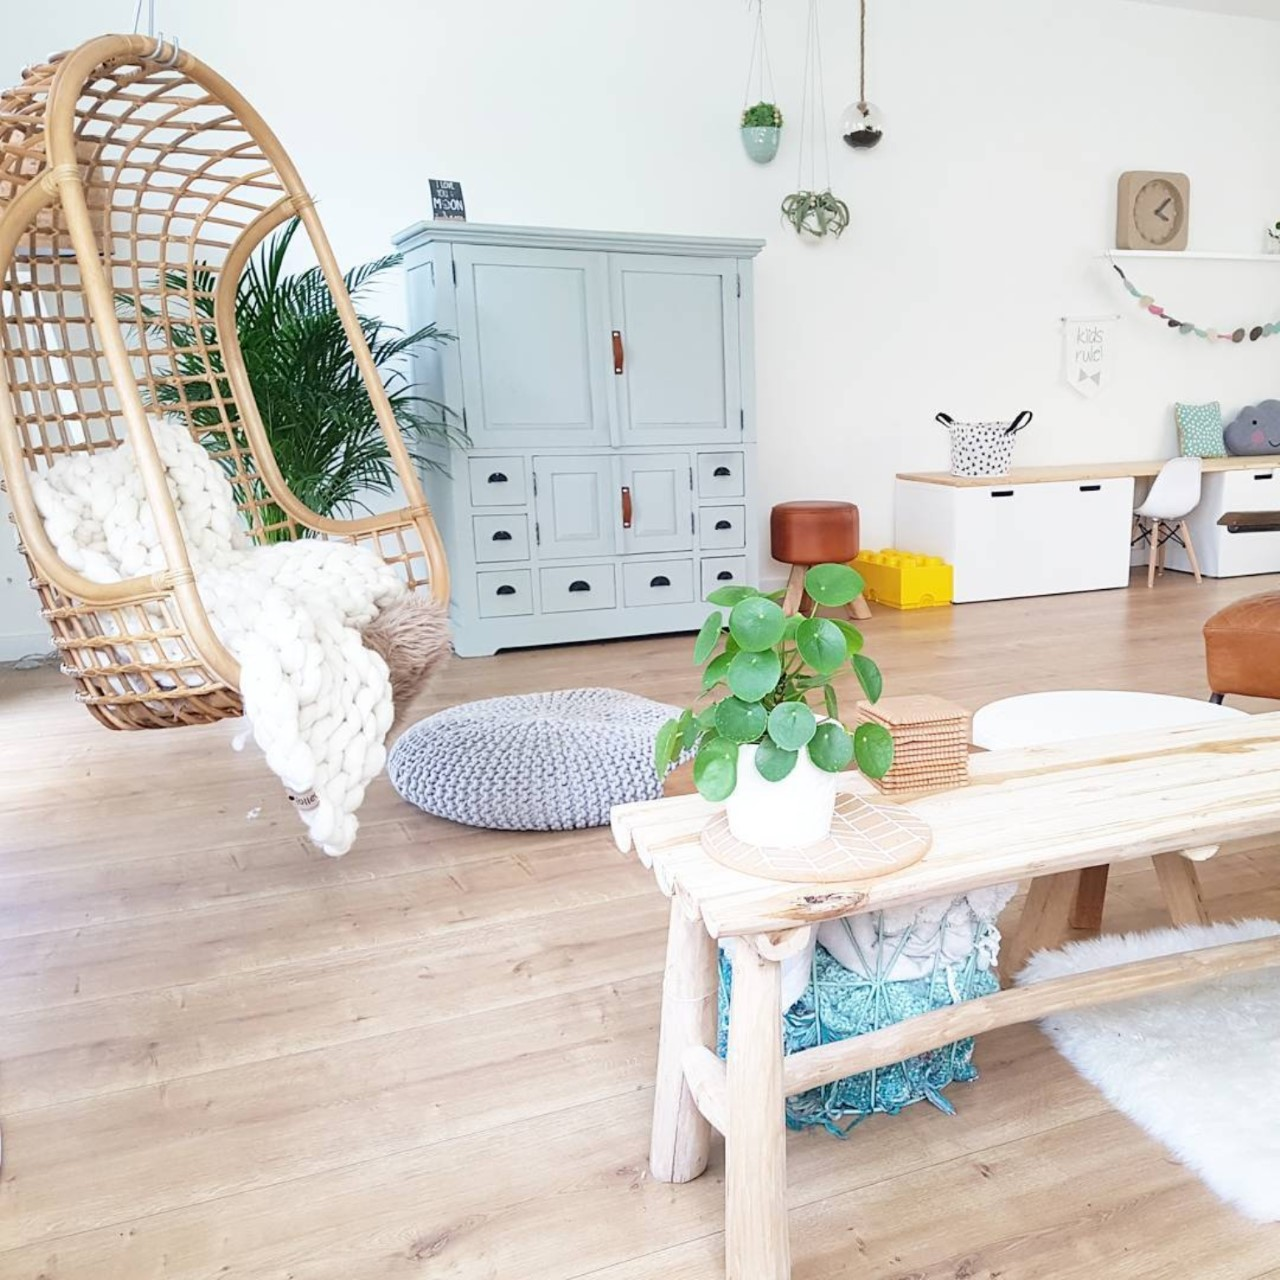 Hk Living Hangstoel Buiten.Mooie Witte Hangstoel Egg Hangstoel Cocoon Relax Wit Hangstoelen